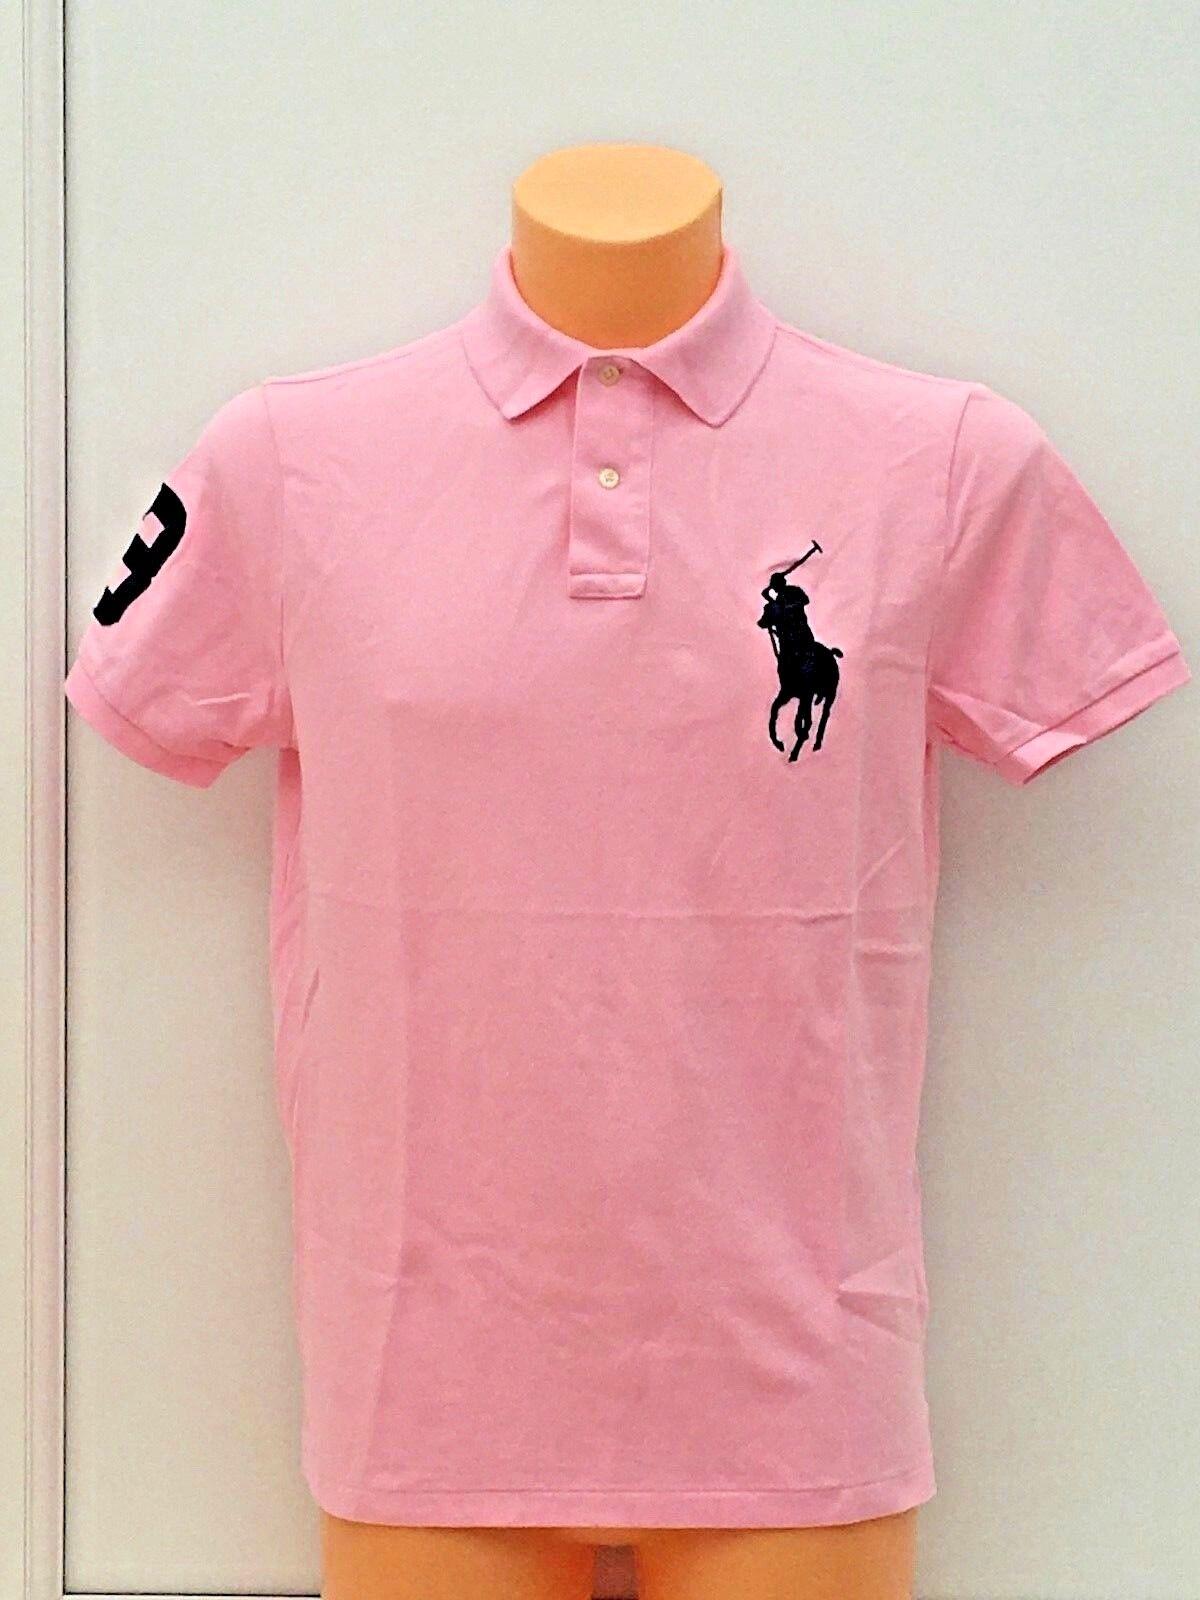 POLO RALPH LAUREN Signature Pony Logo Polo Shirt in Pink Sizes M - XXL BNWOT